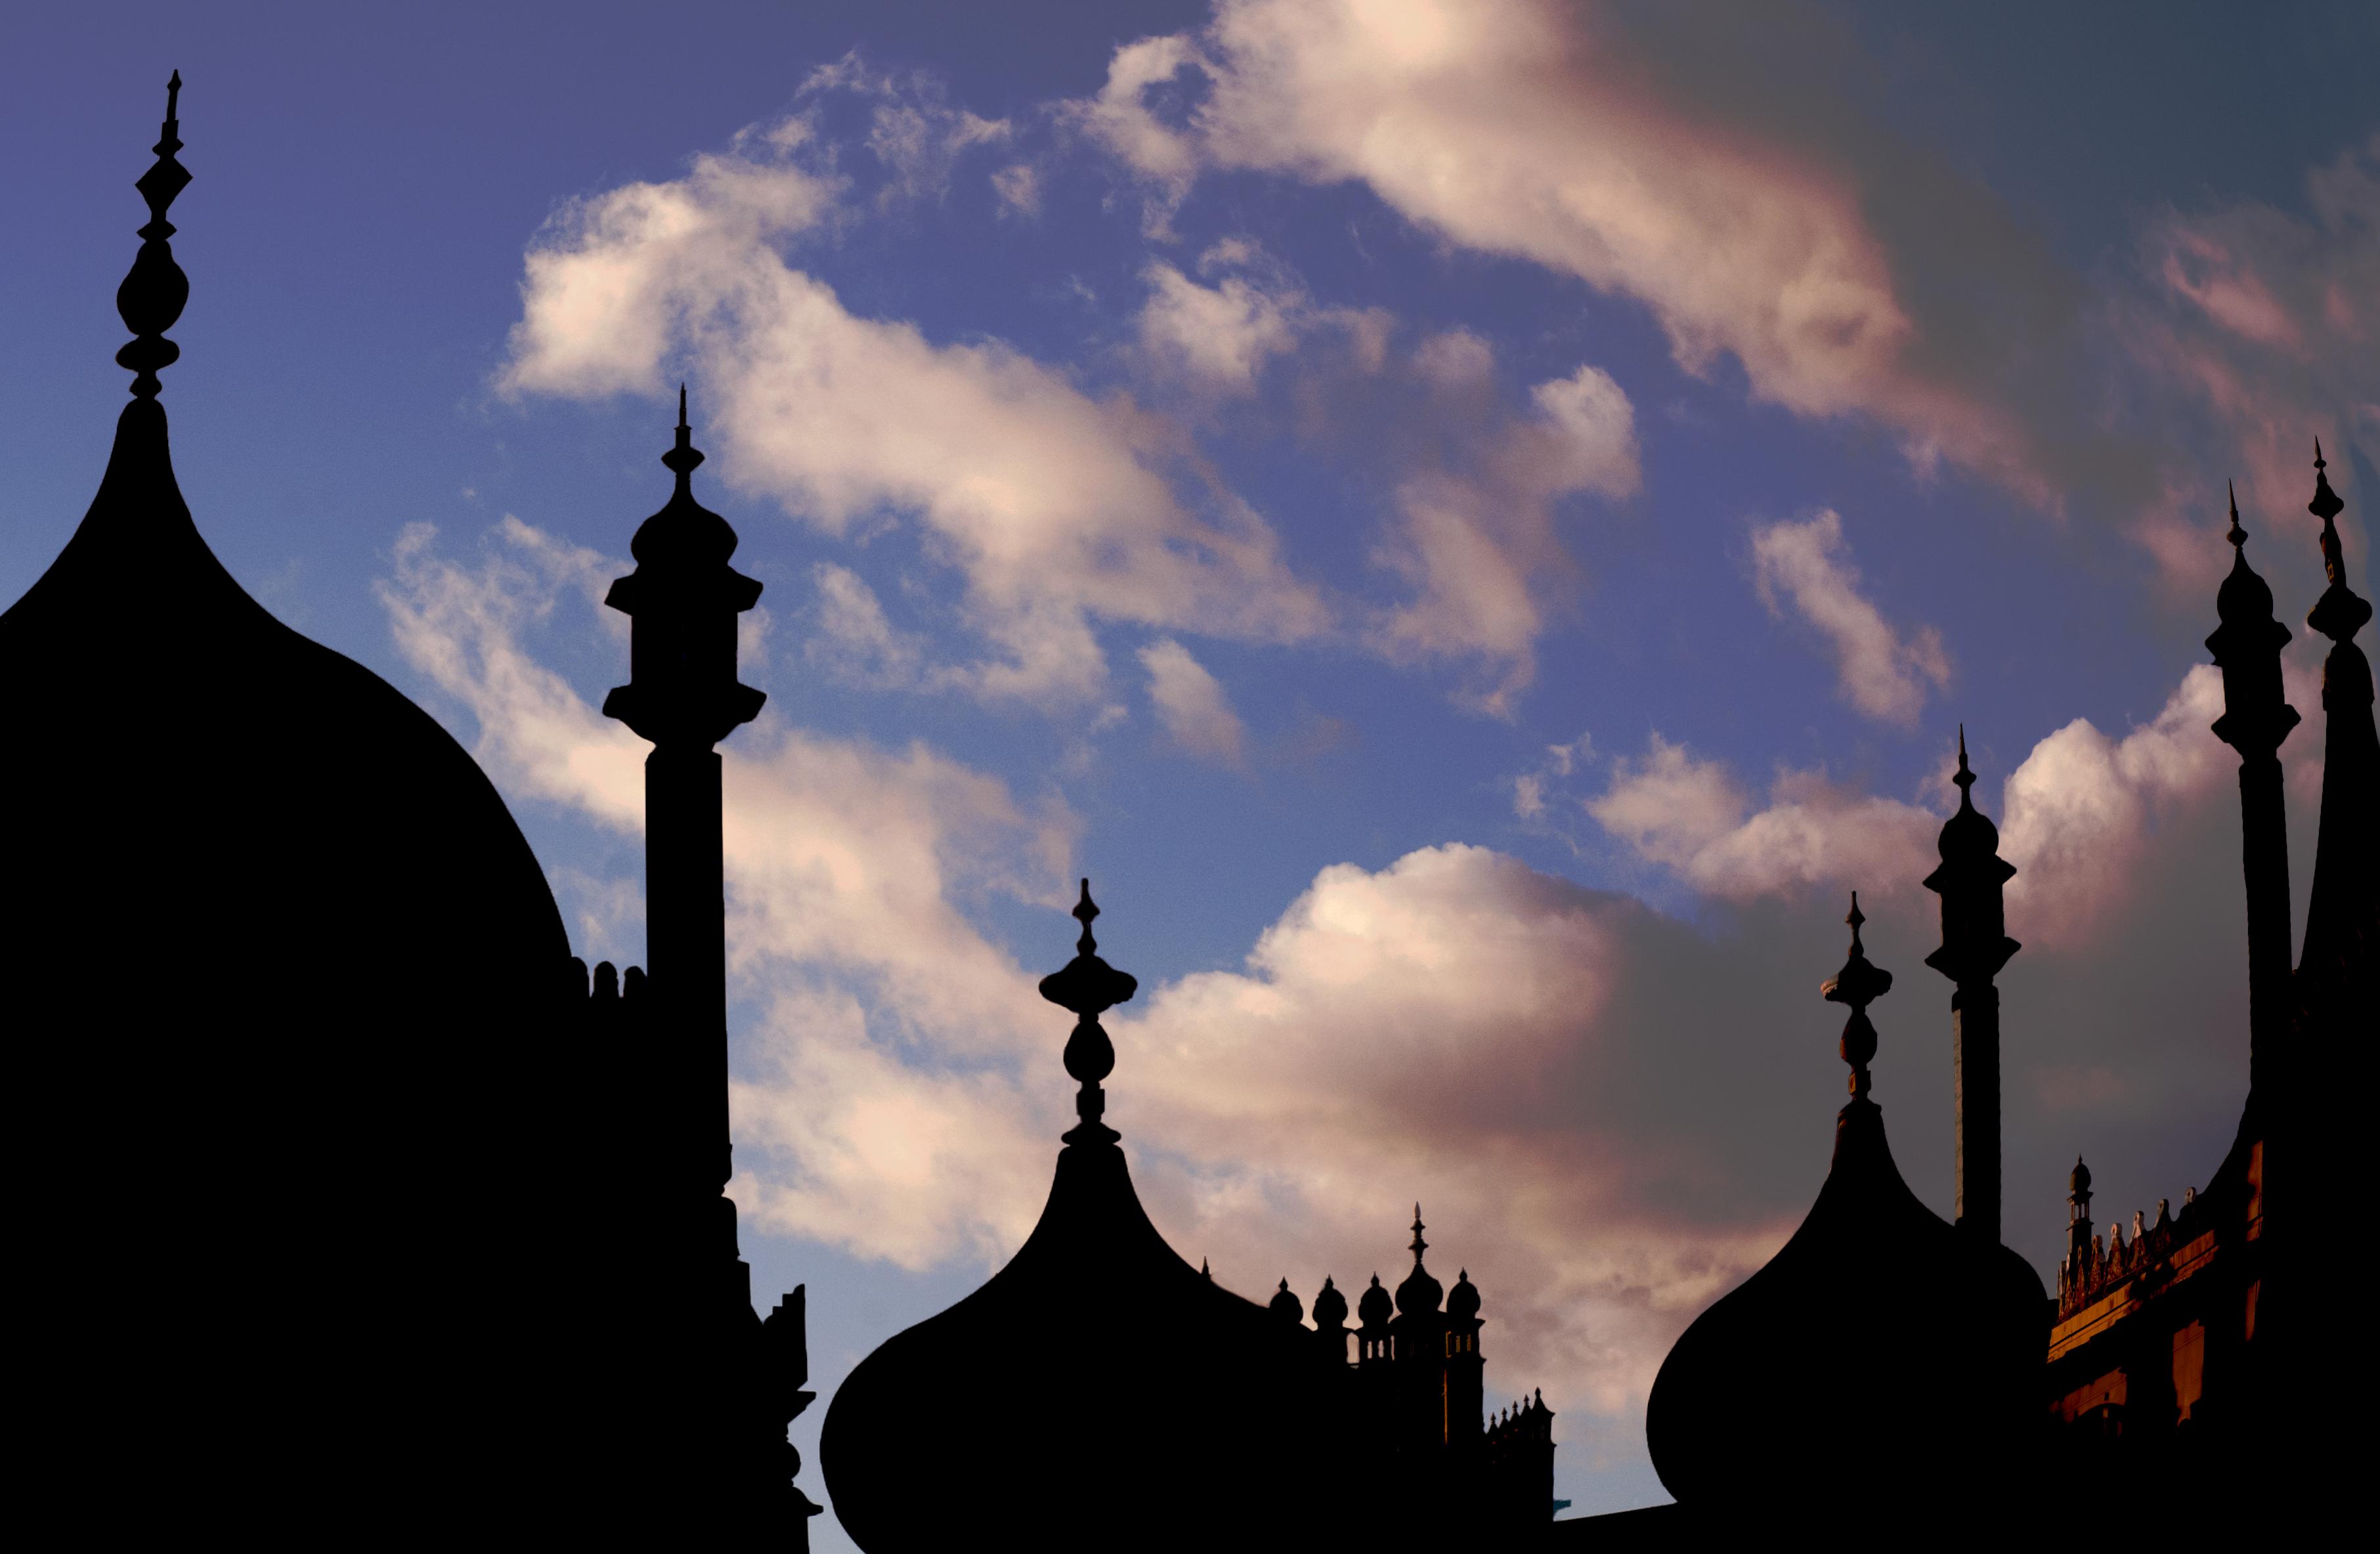 Royal Pavilion silhouette